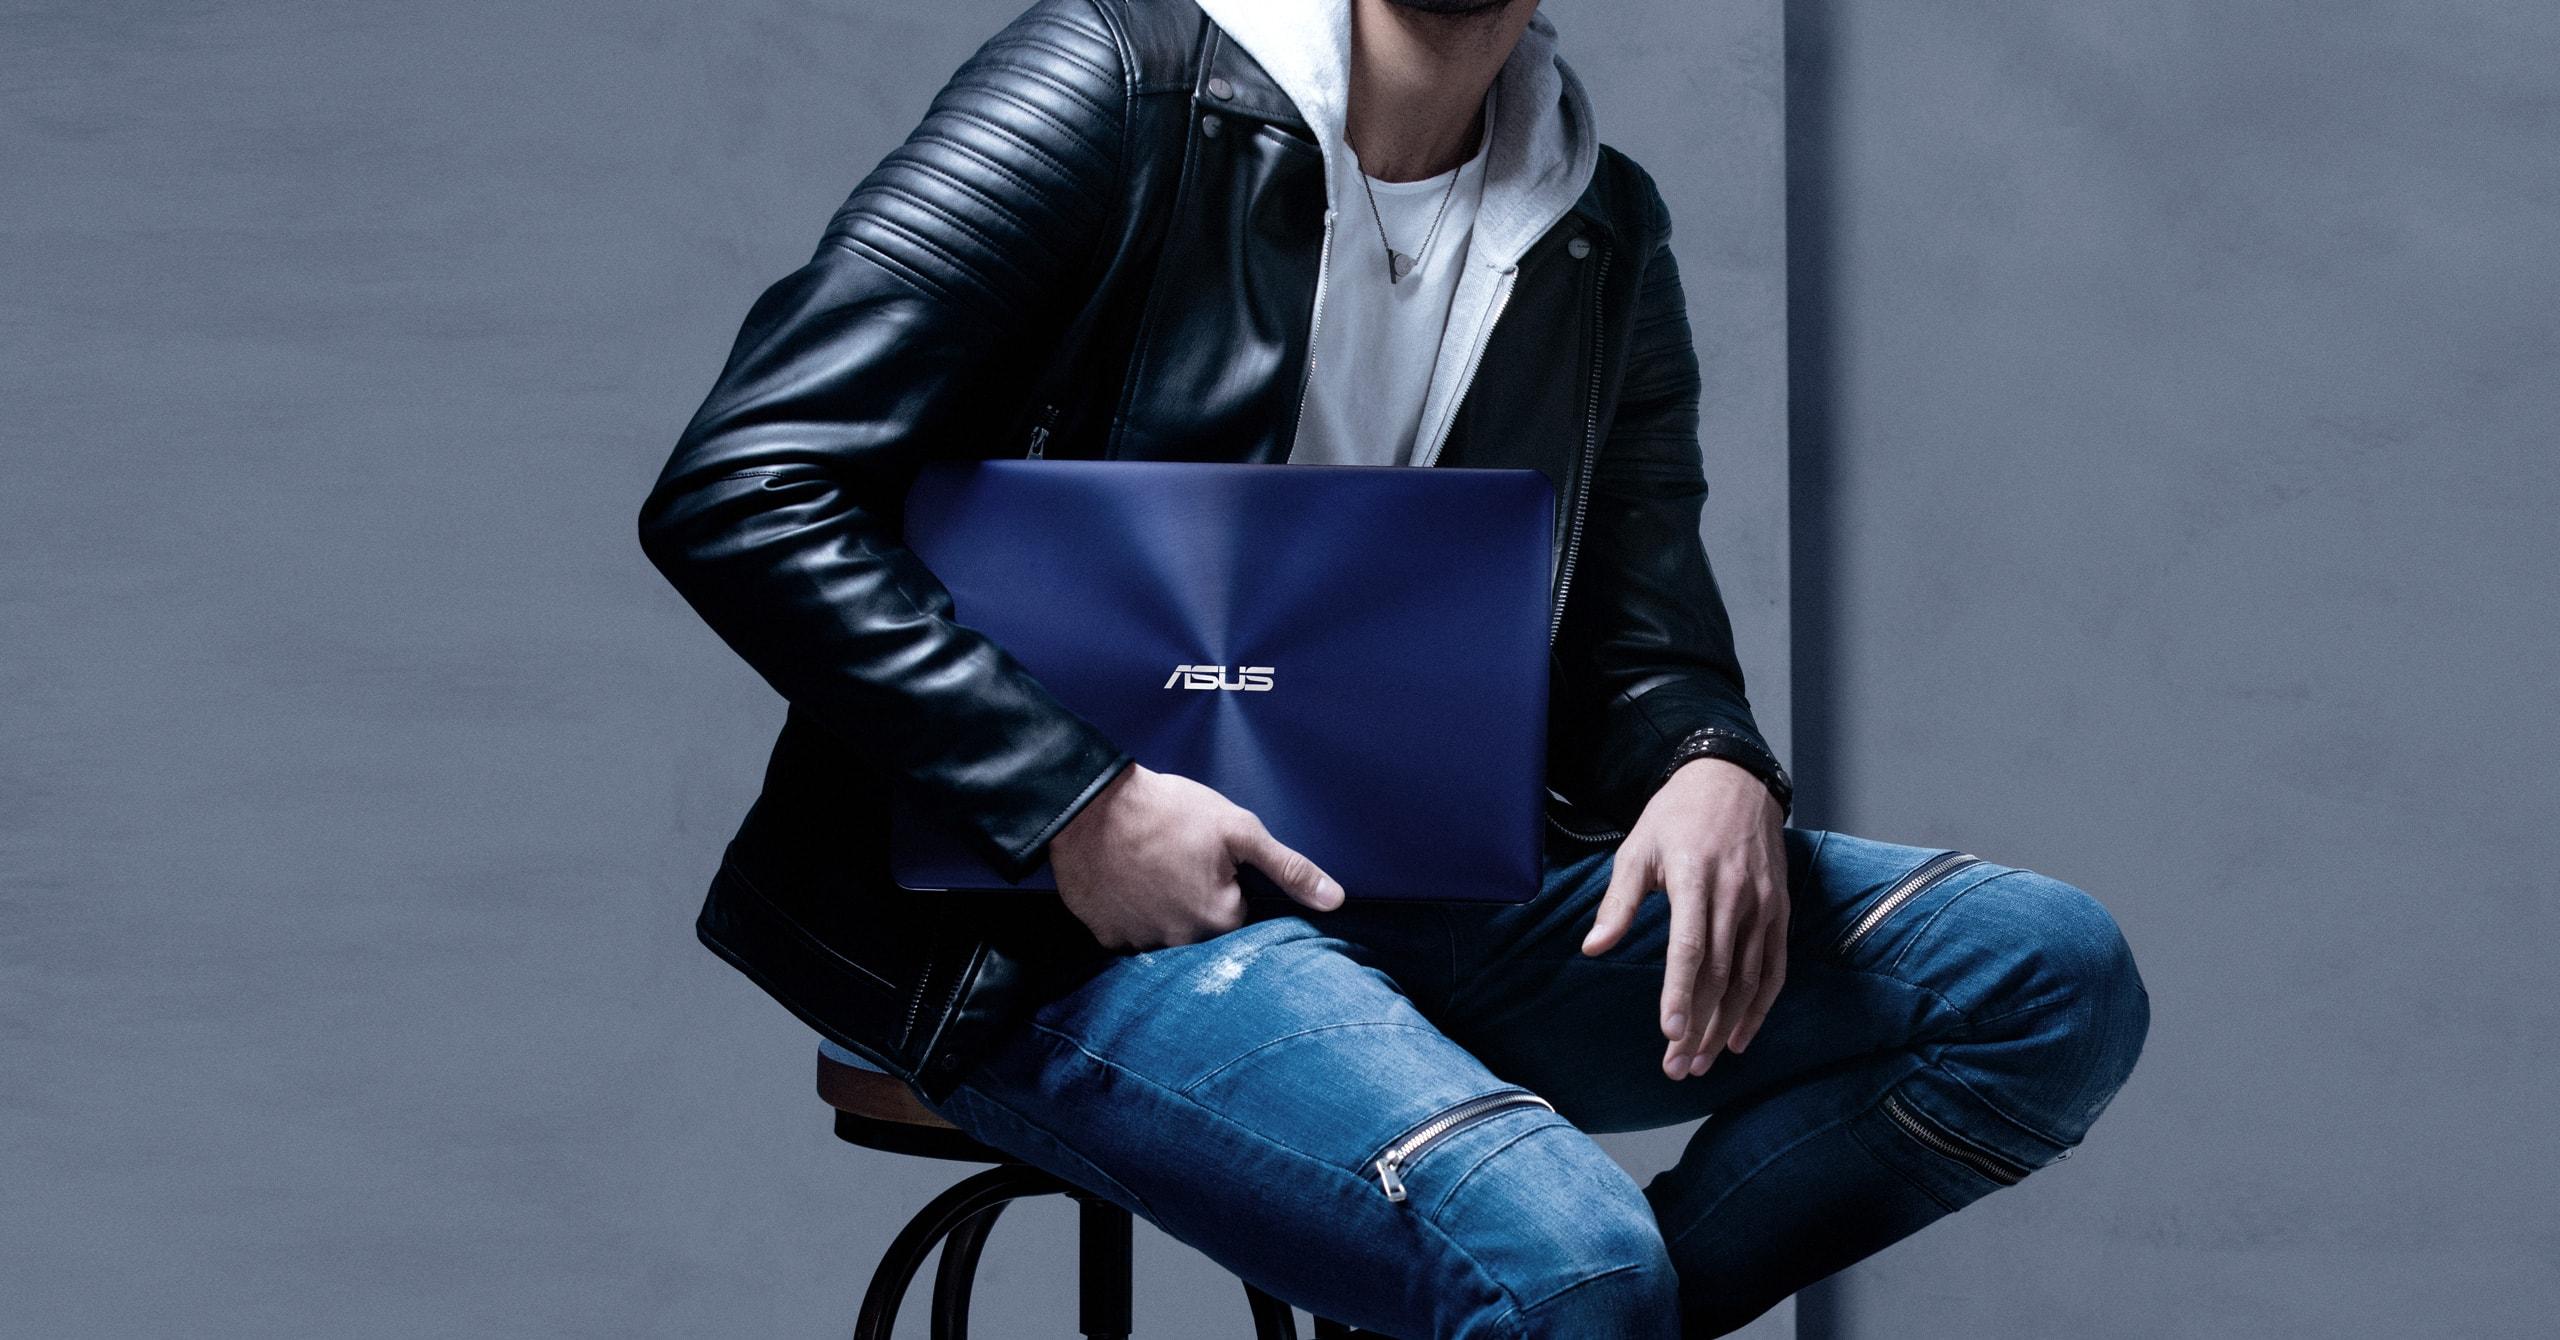 ASUS ZenBook Pro UX550; UX550VD